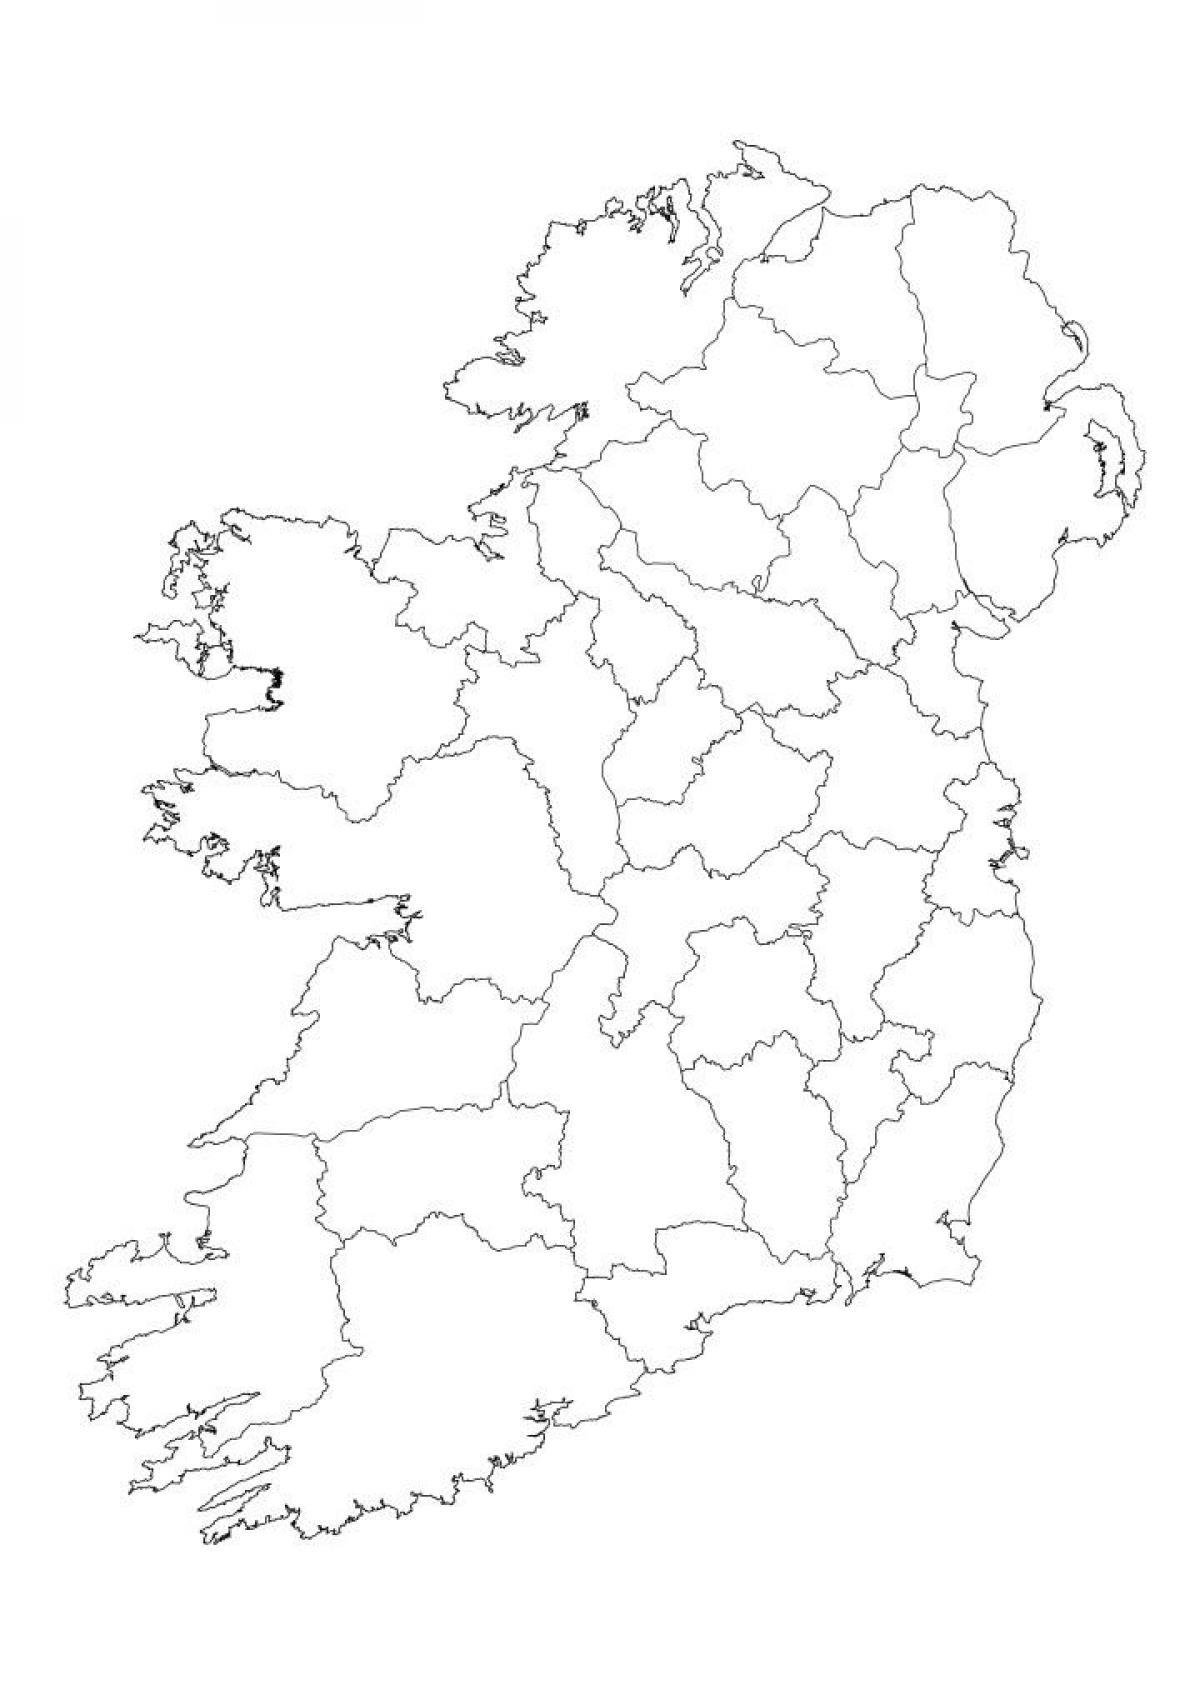 Irsko Slepa Mapa Irsko Mapa Obrys Severni Evropa Evropa